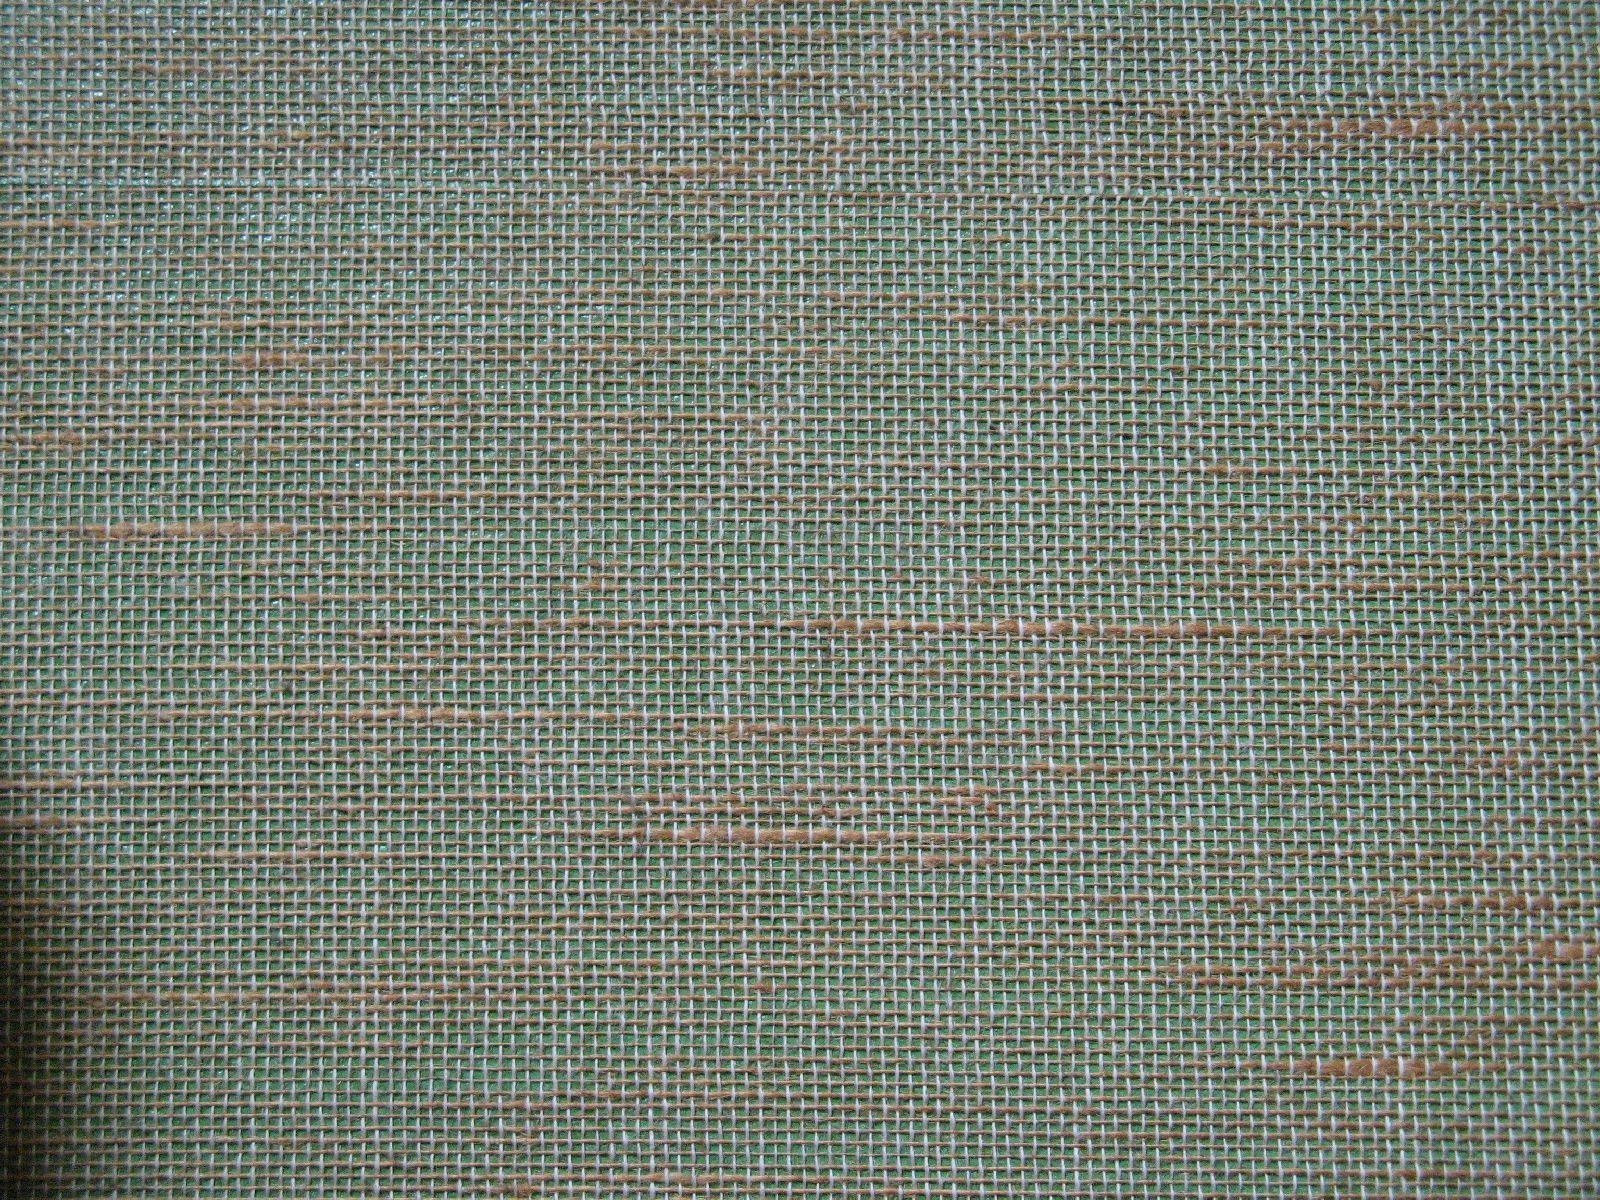 Innenraum-Material_Textur_B_0290